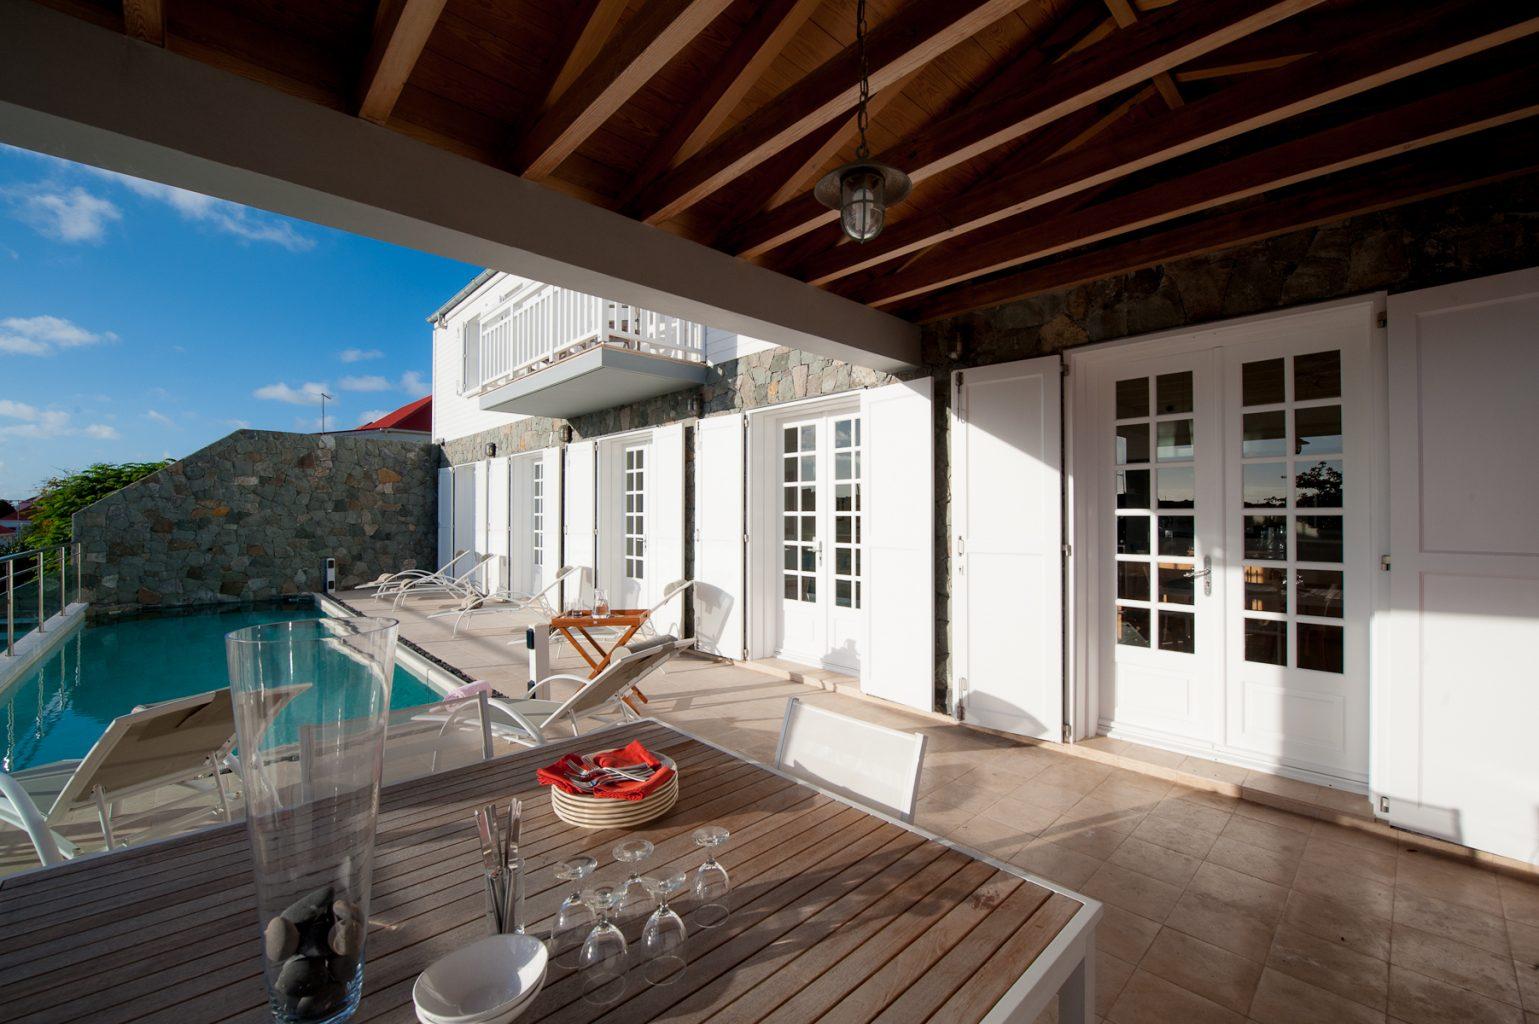 Villa Sur Le Port - Luxury Villa Rental in the Heart of Gustavia St Barth - Terrace